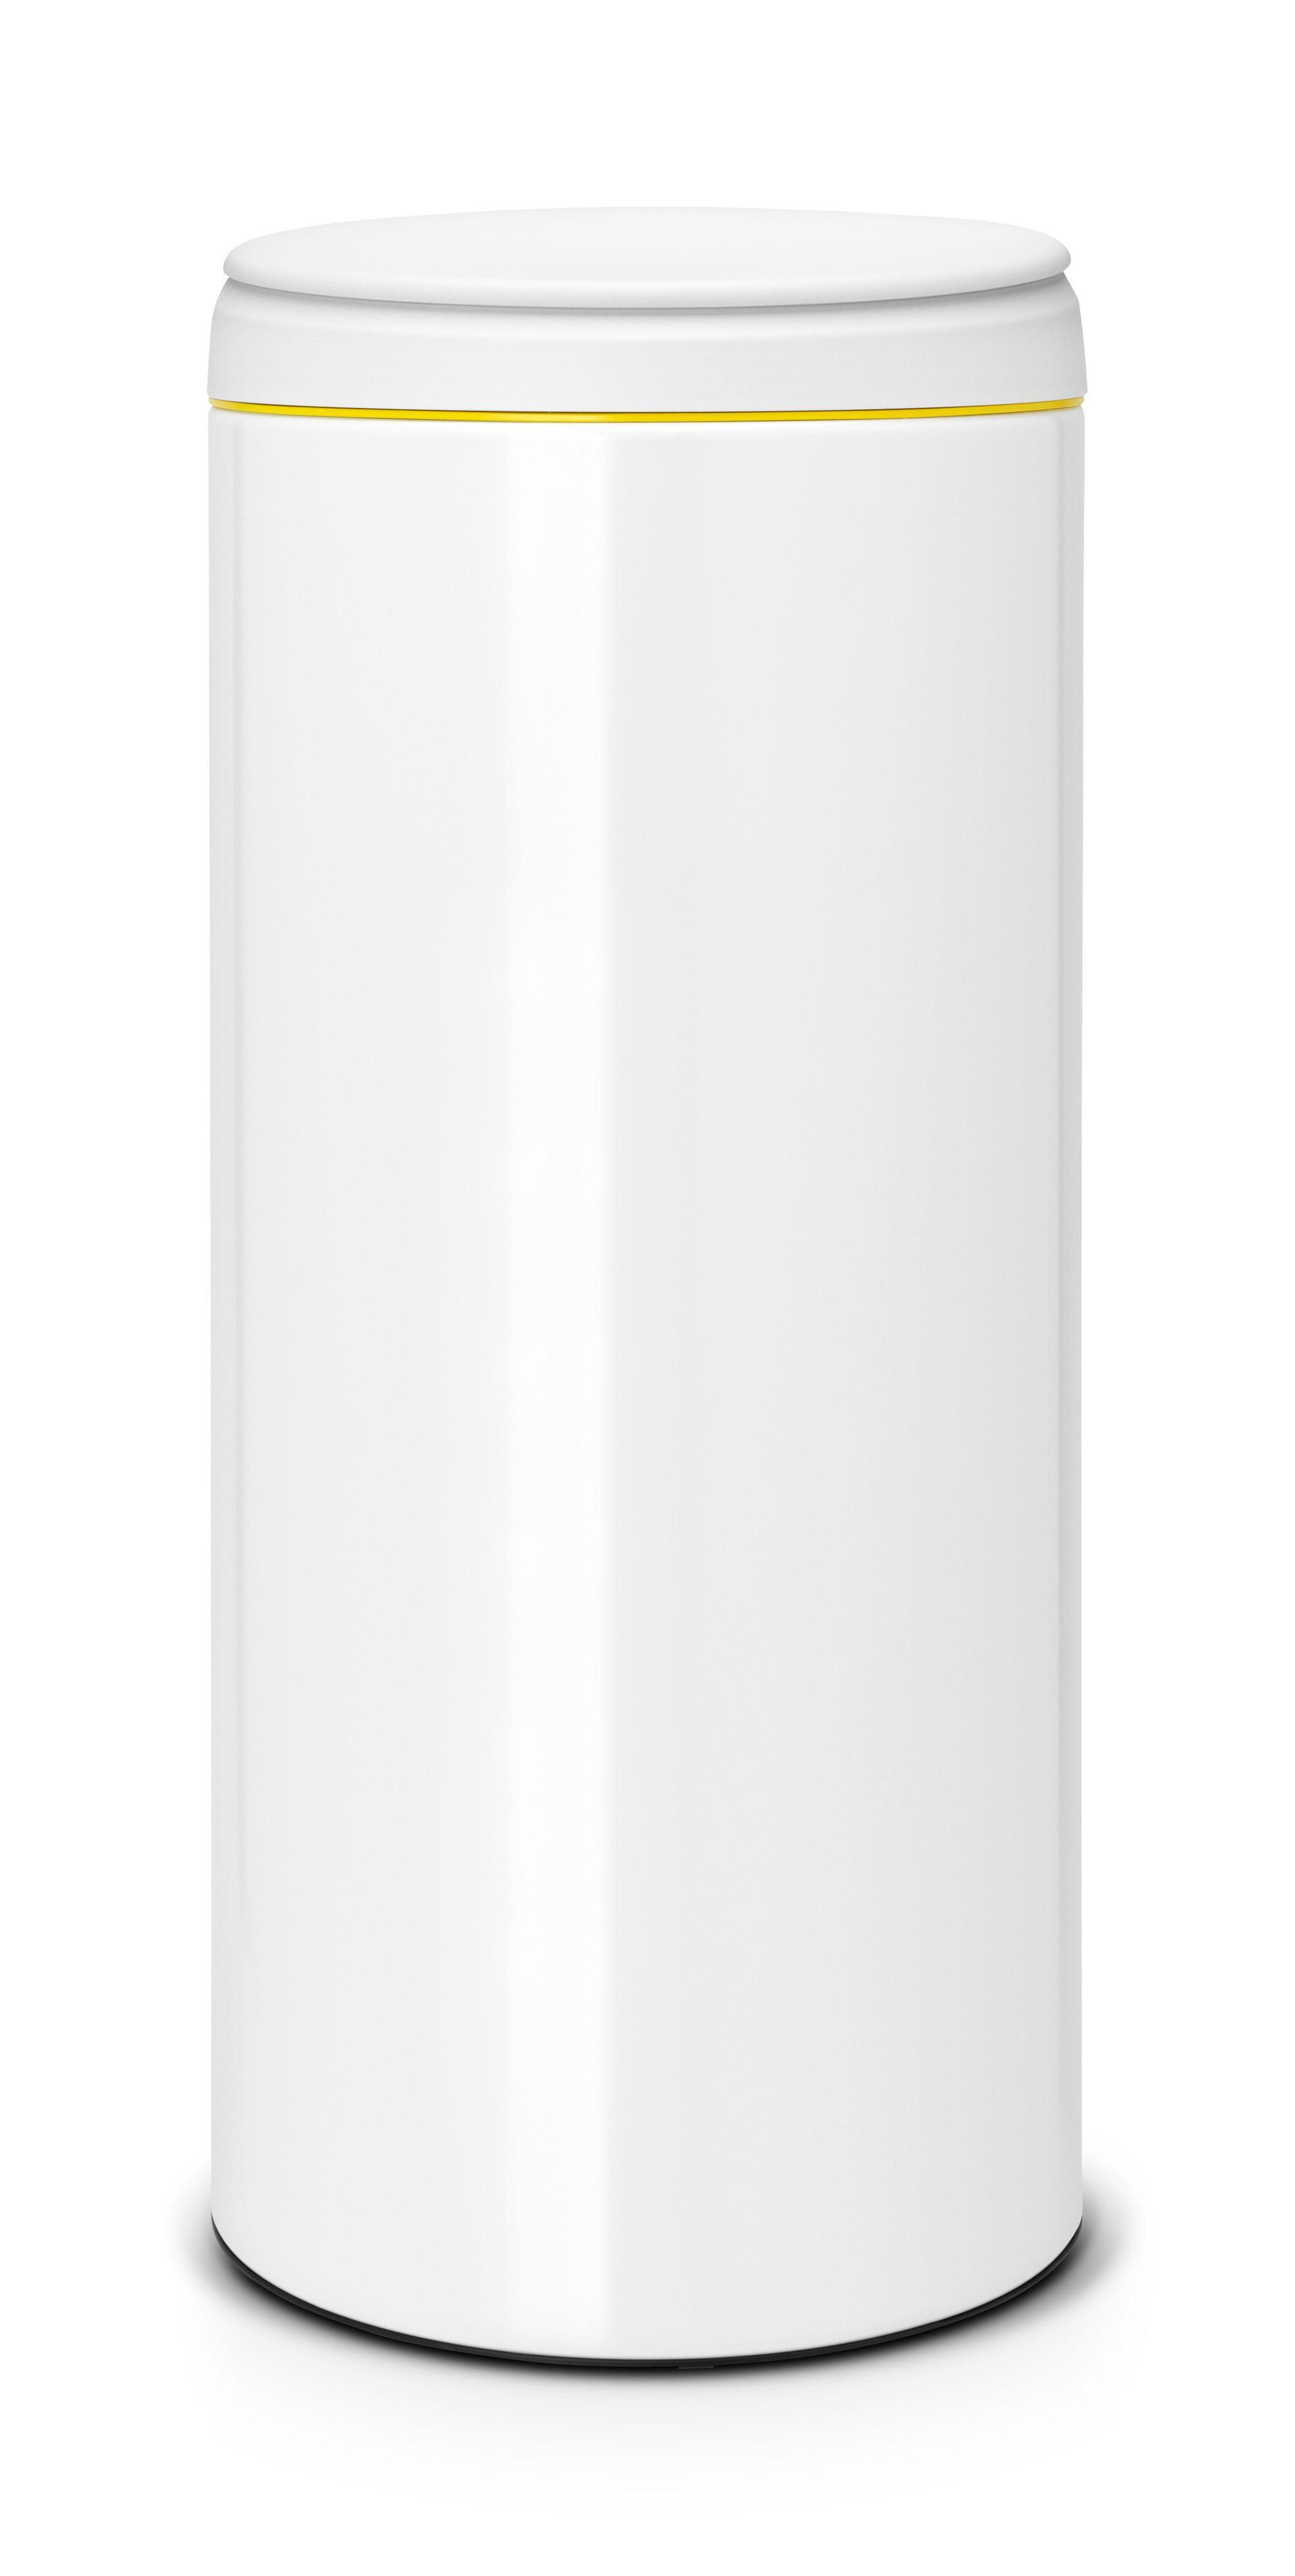 White Kitchen Bin Part - 39: Brabantia Gloss White Metal Round Flip Top Kitchen Bin, 30L | Departments |  DIY At Bu0026Q